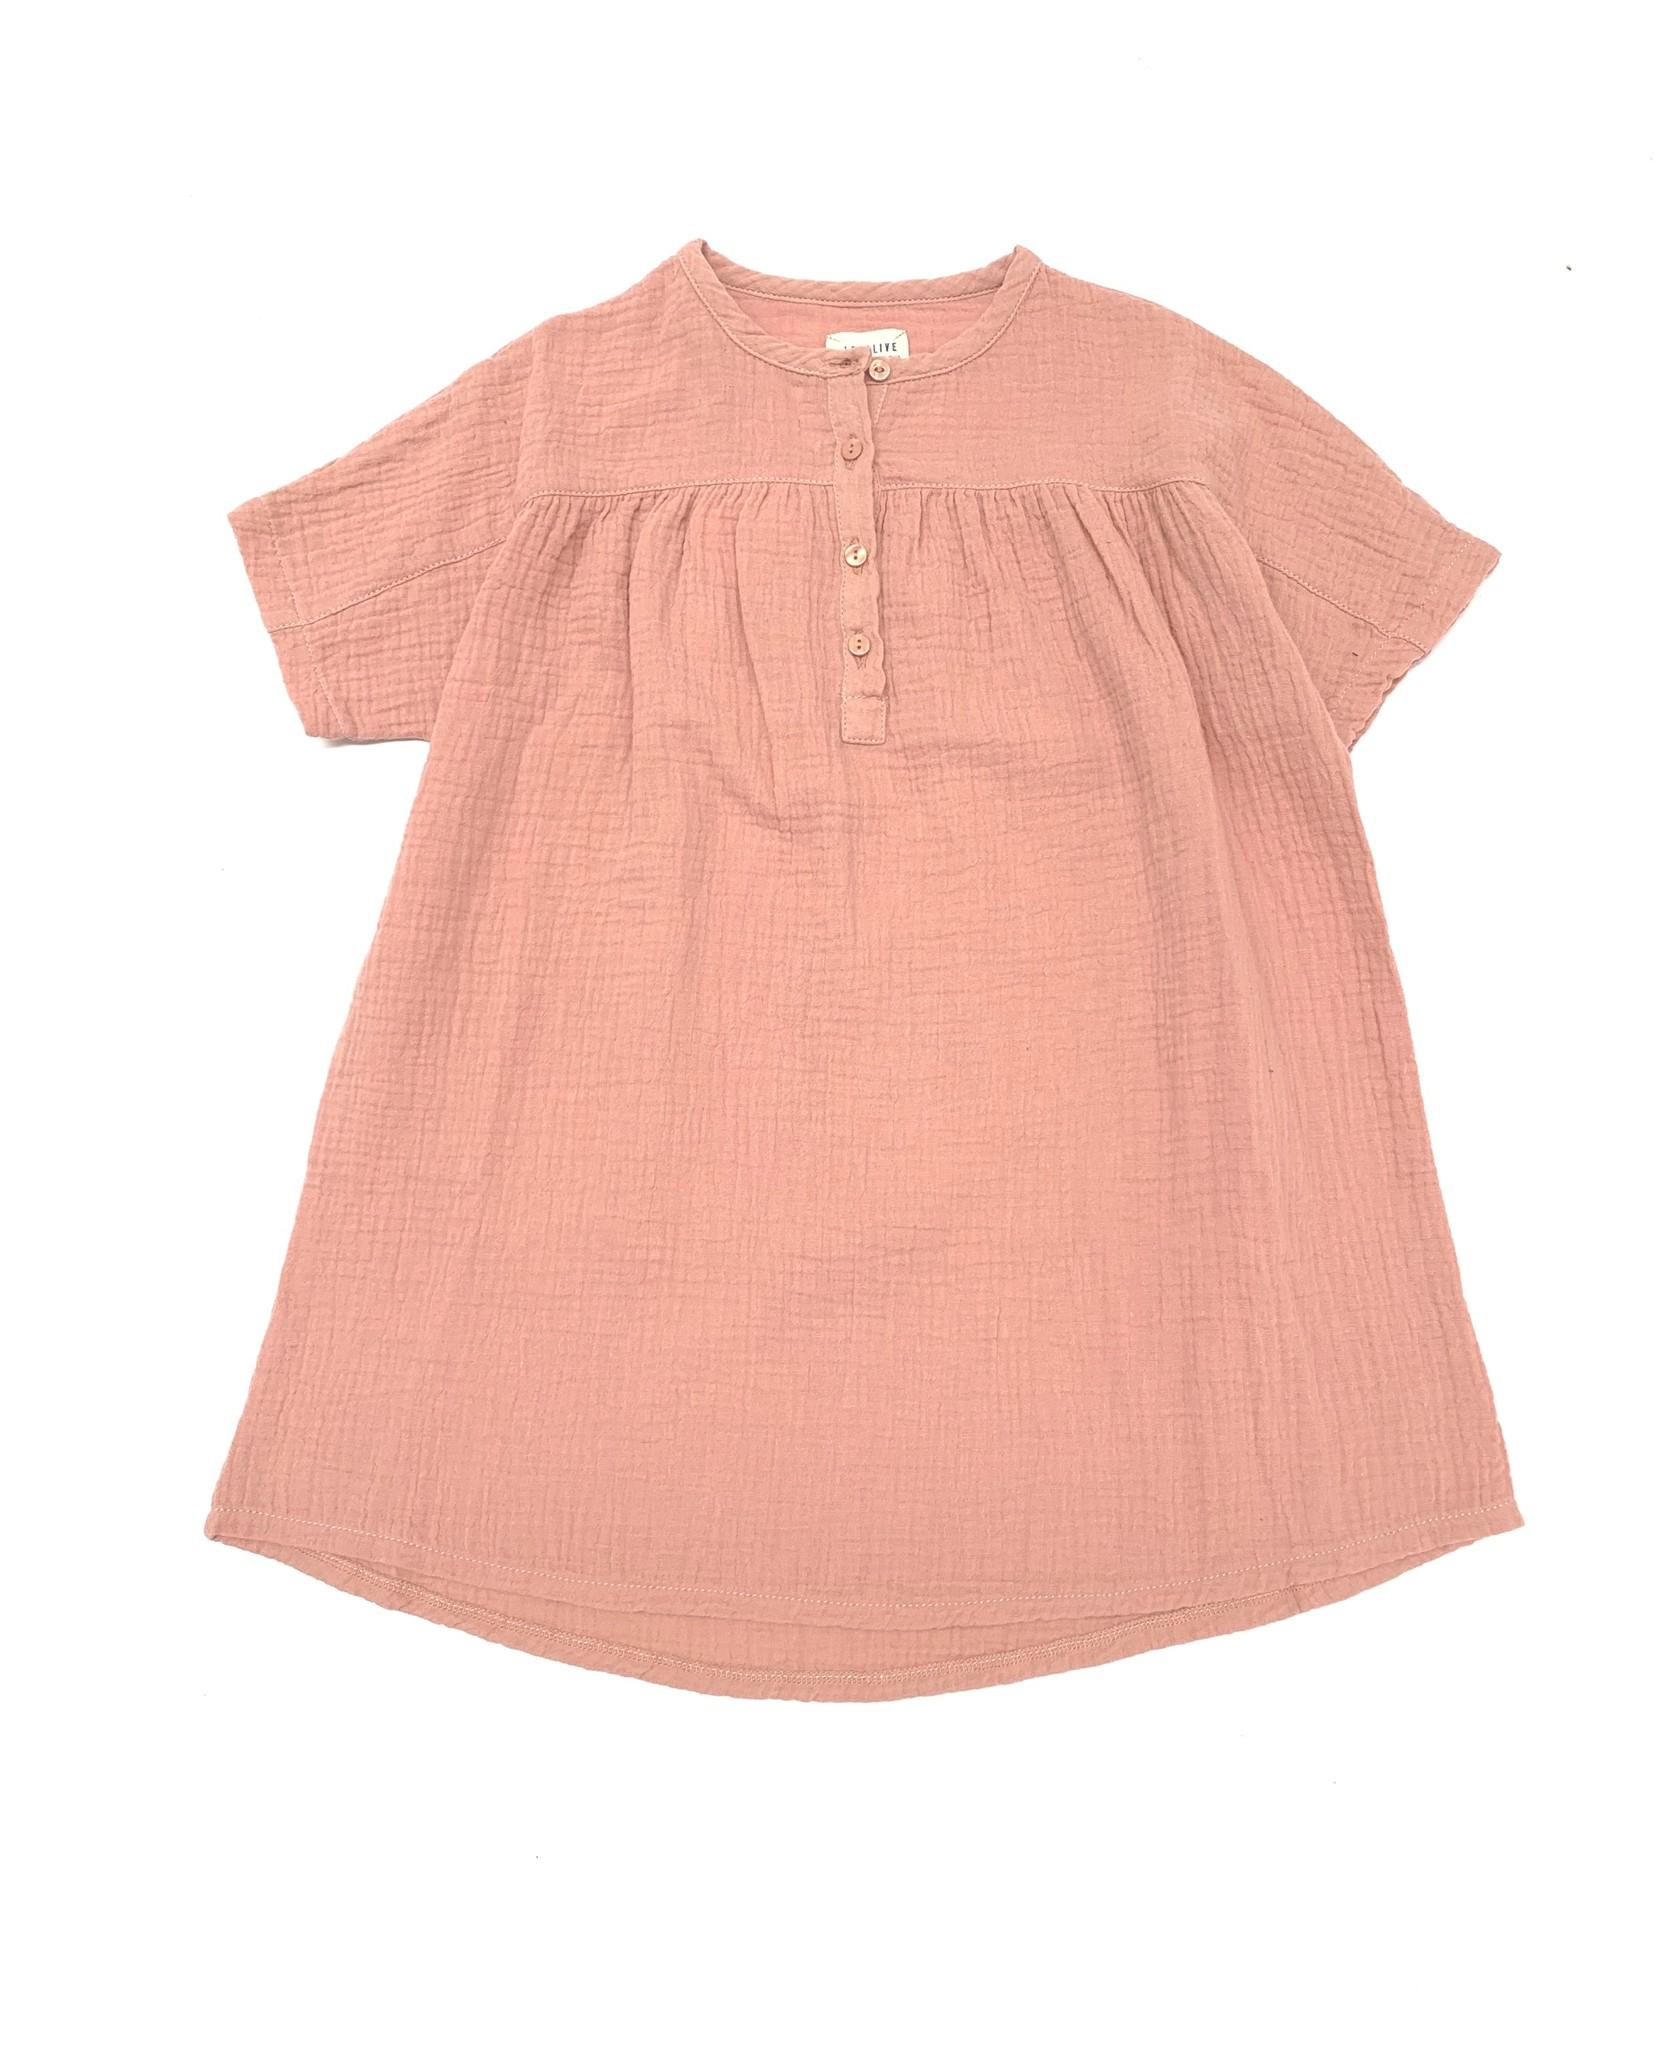 Dress Crinkle-1